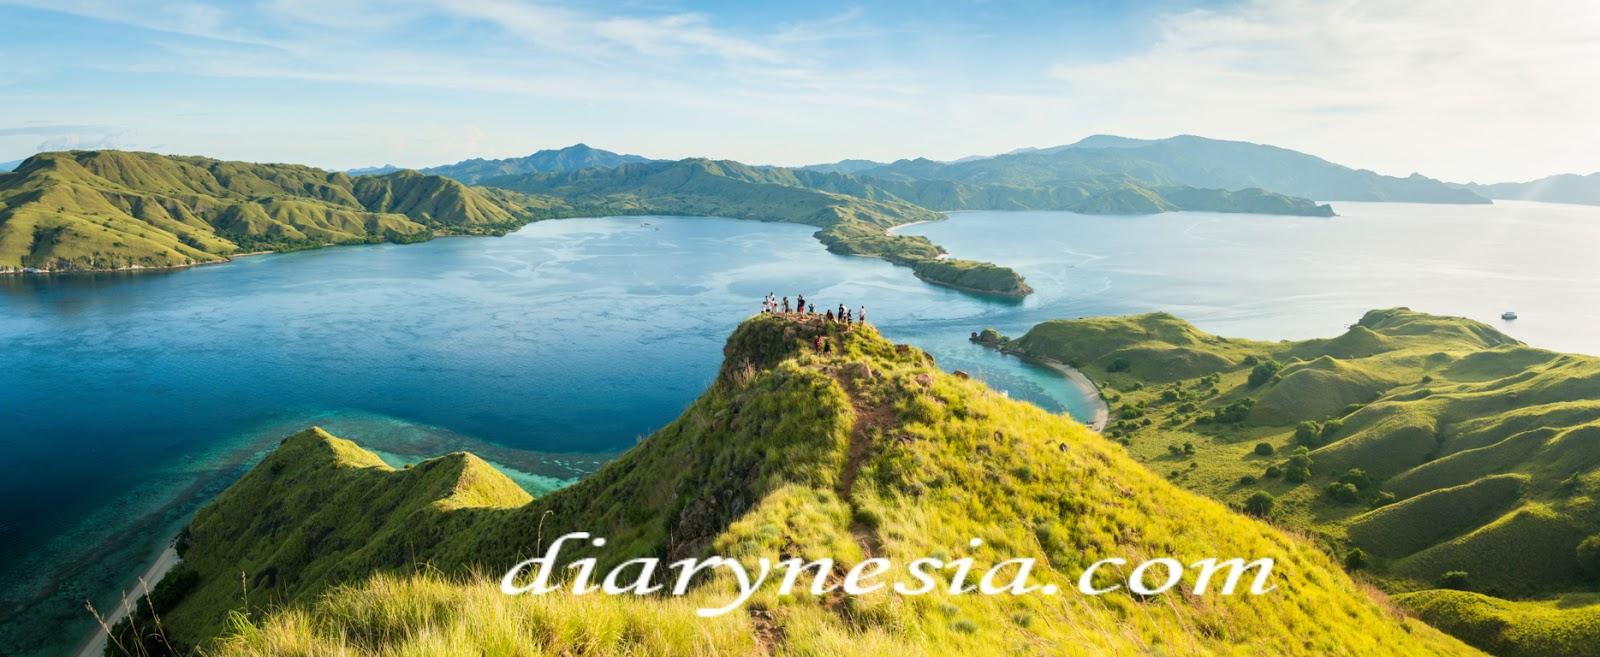 komodo national park must visit destination, east nusa tenggara tourism, gili laba tourist destination, diarynesia